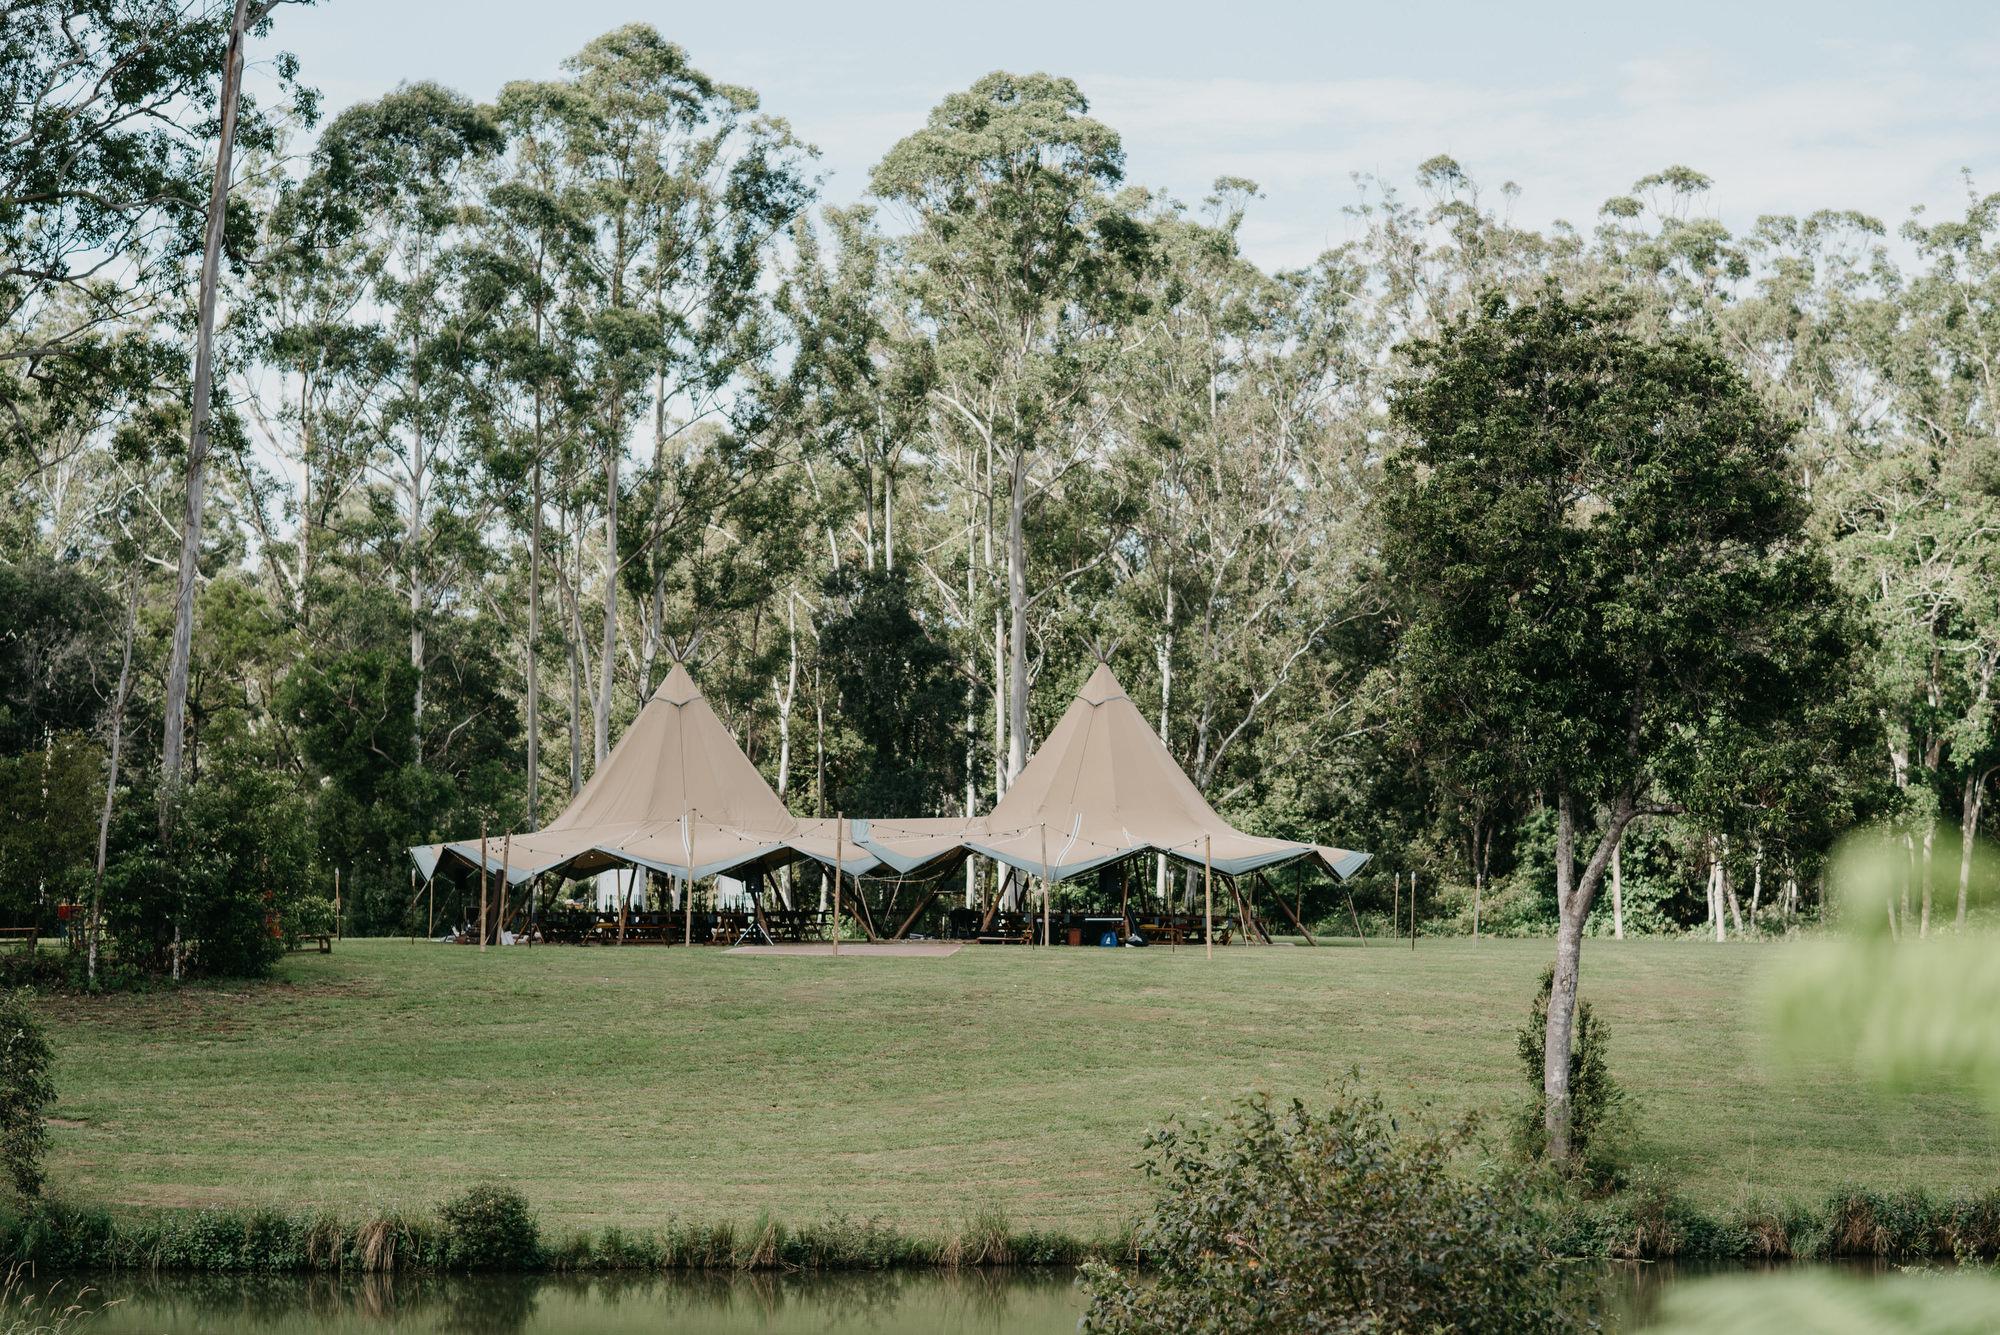 EPHEMERAL CREATIVE Falls Farm Wedding Sunshine Coast with Tipi tent